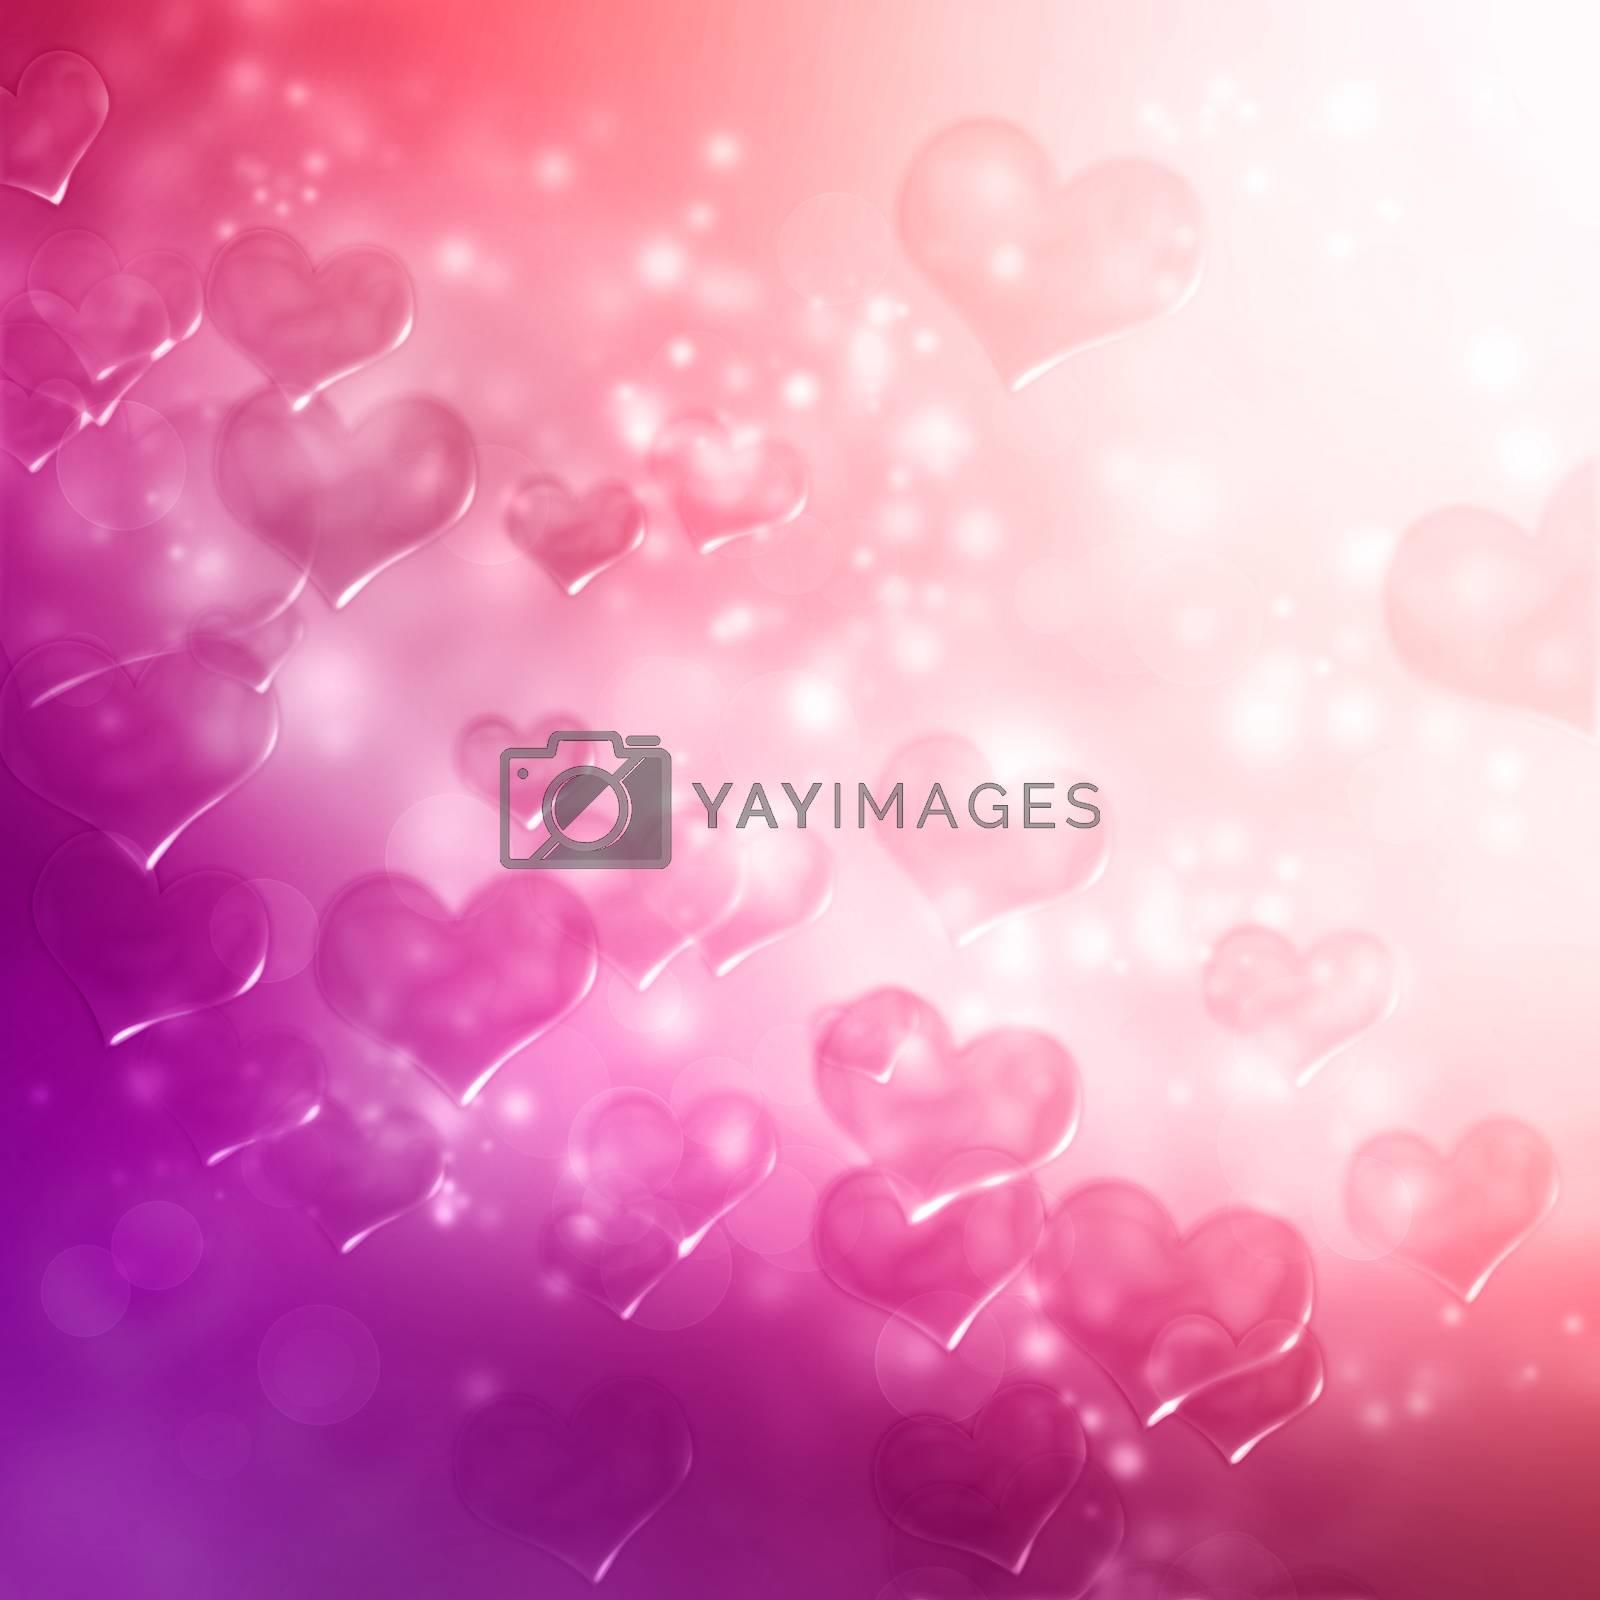 Royalty free image of Hearts by melpomene